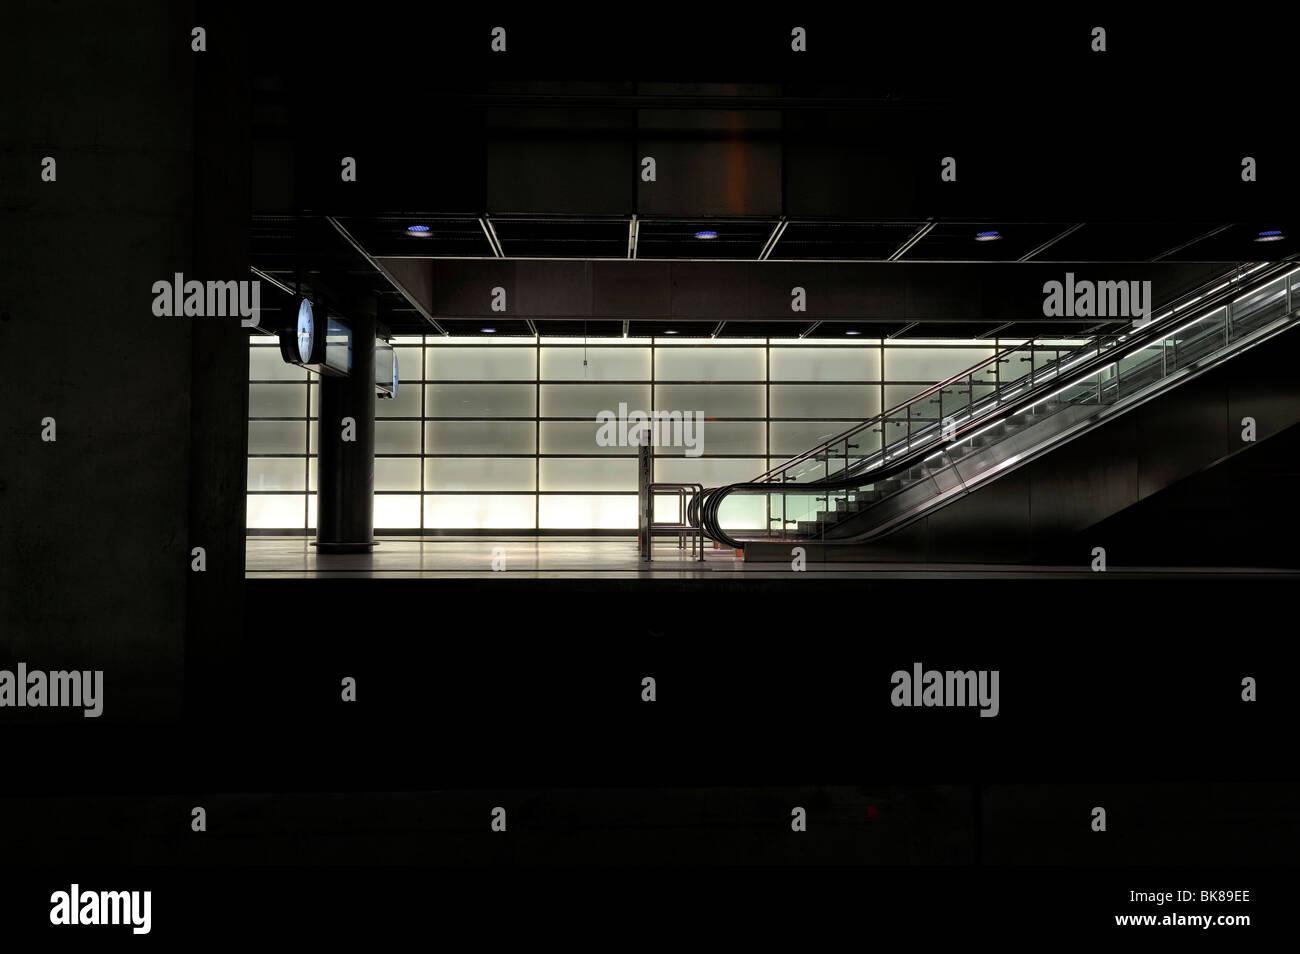 Escalator in a railway station, Berlin Germany - Stock Image